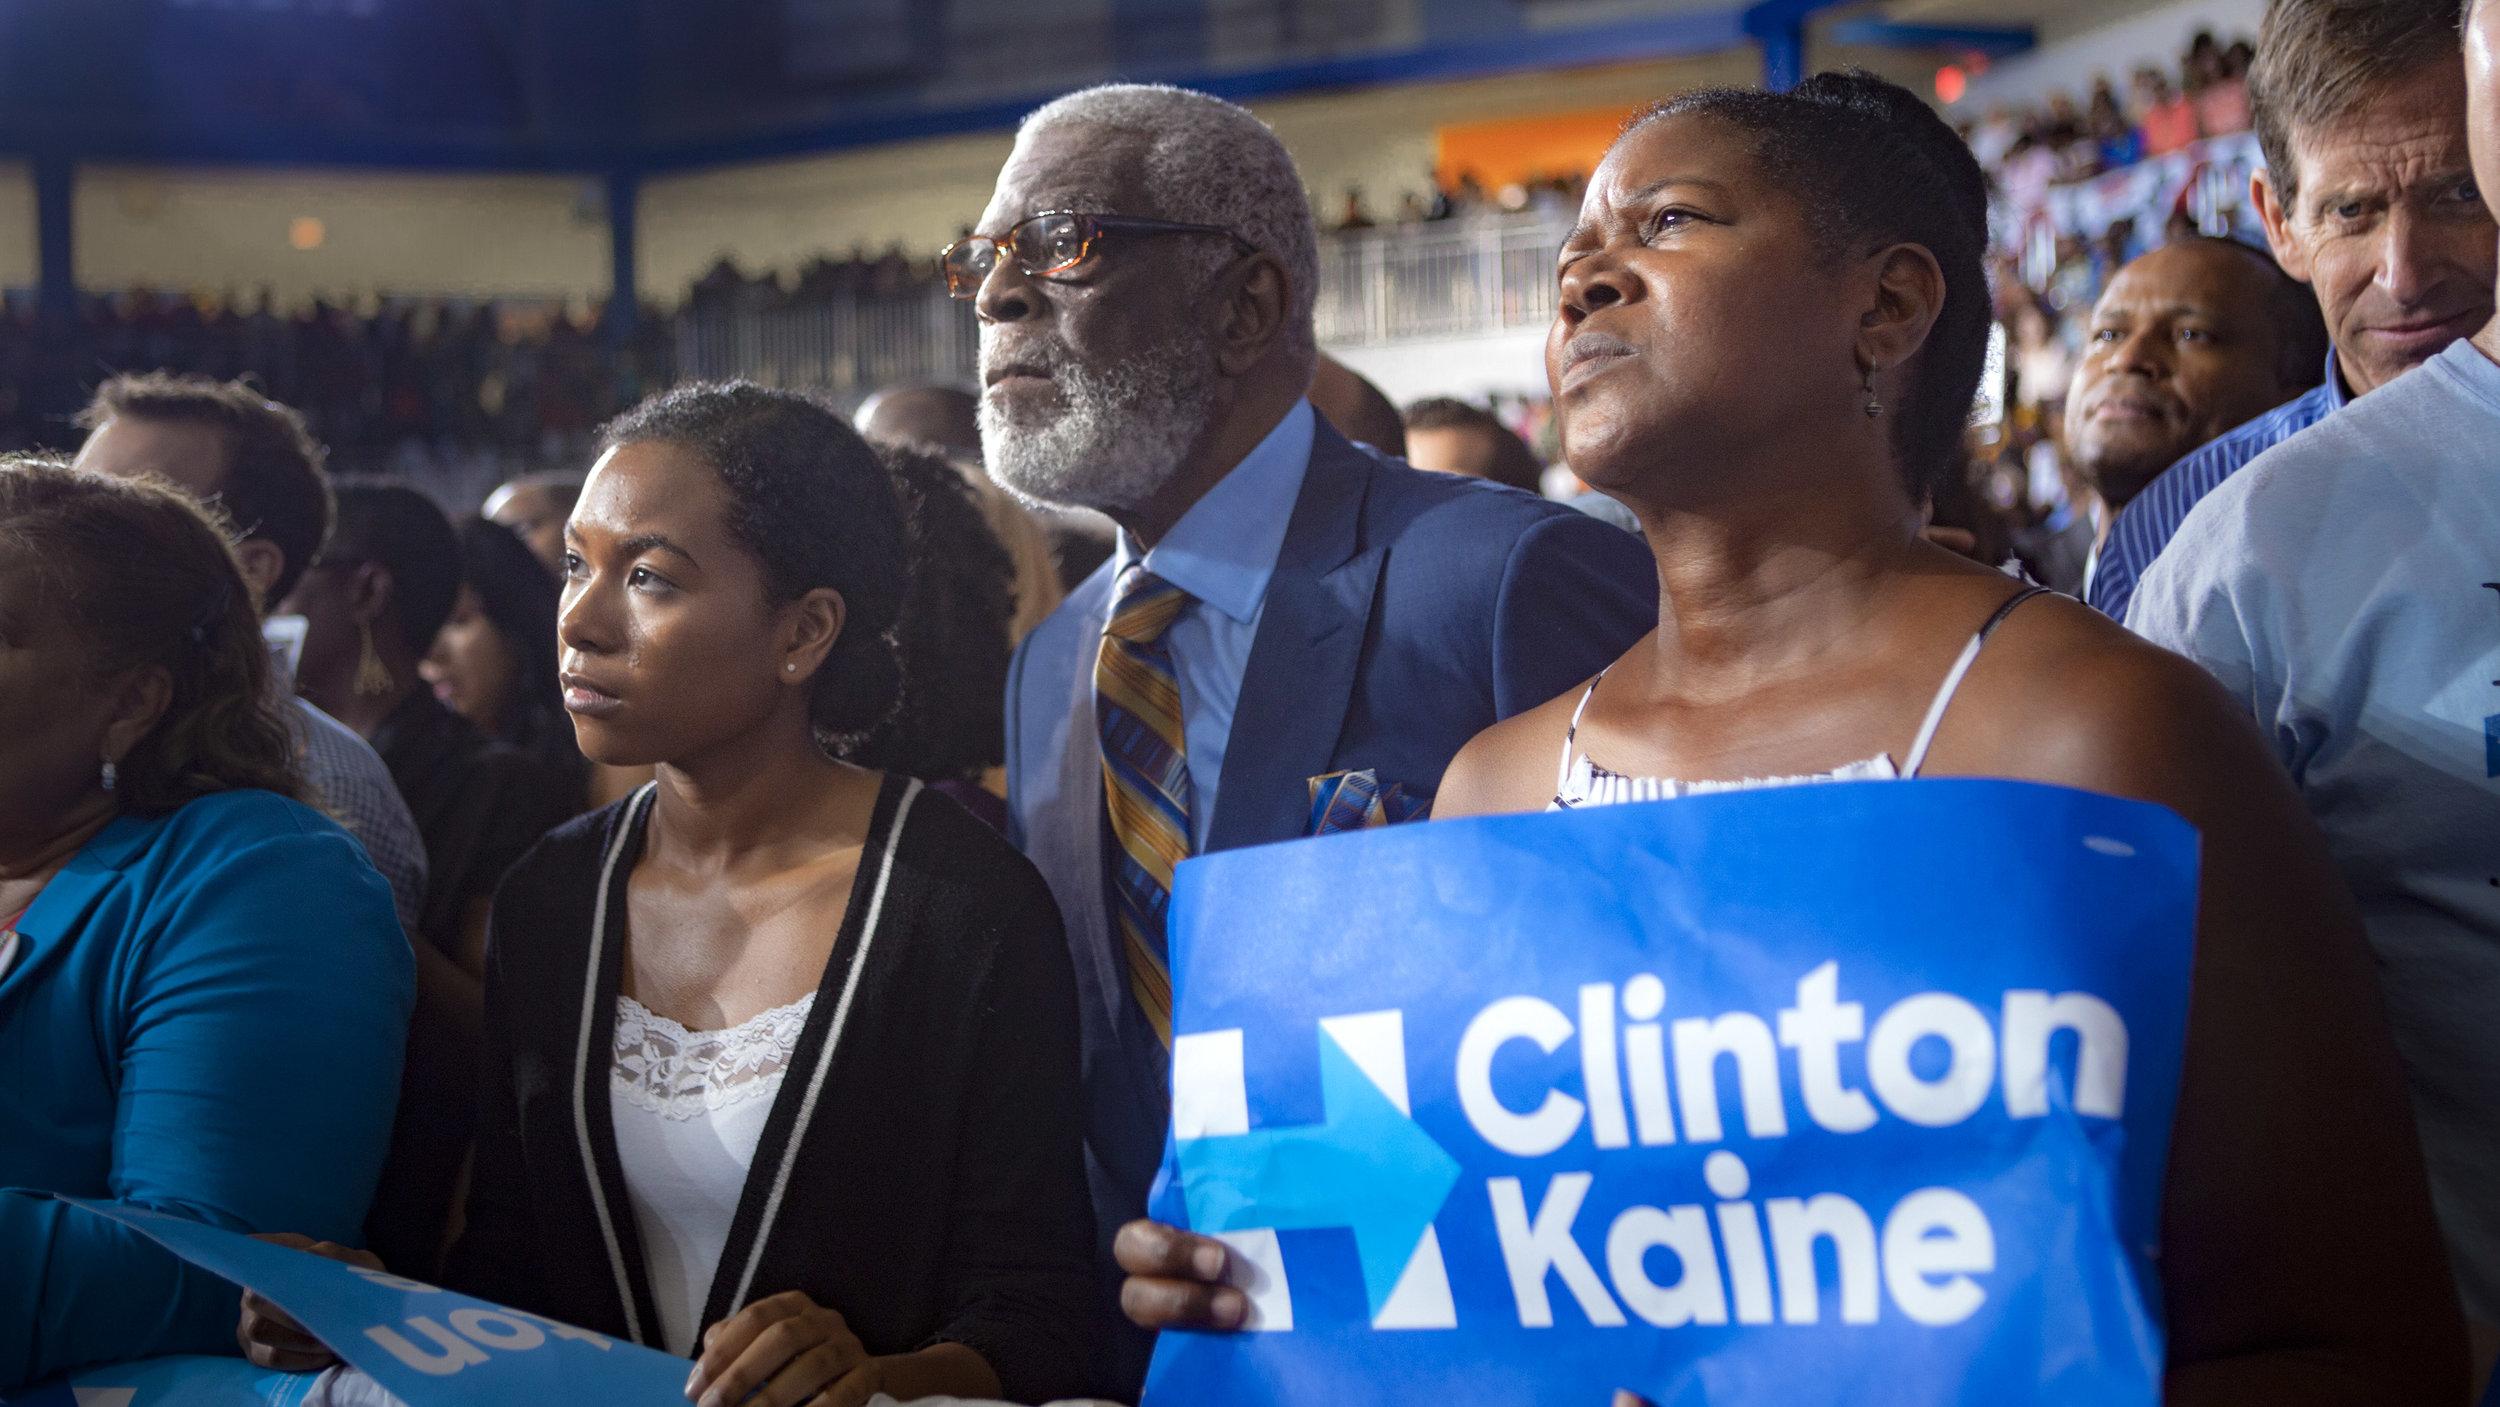 10202016_BJM_Barack_Obama_Campaigns_in_Miami_Florida_02.jpg